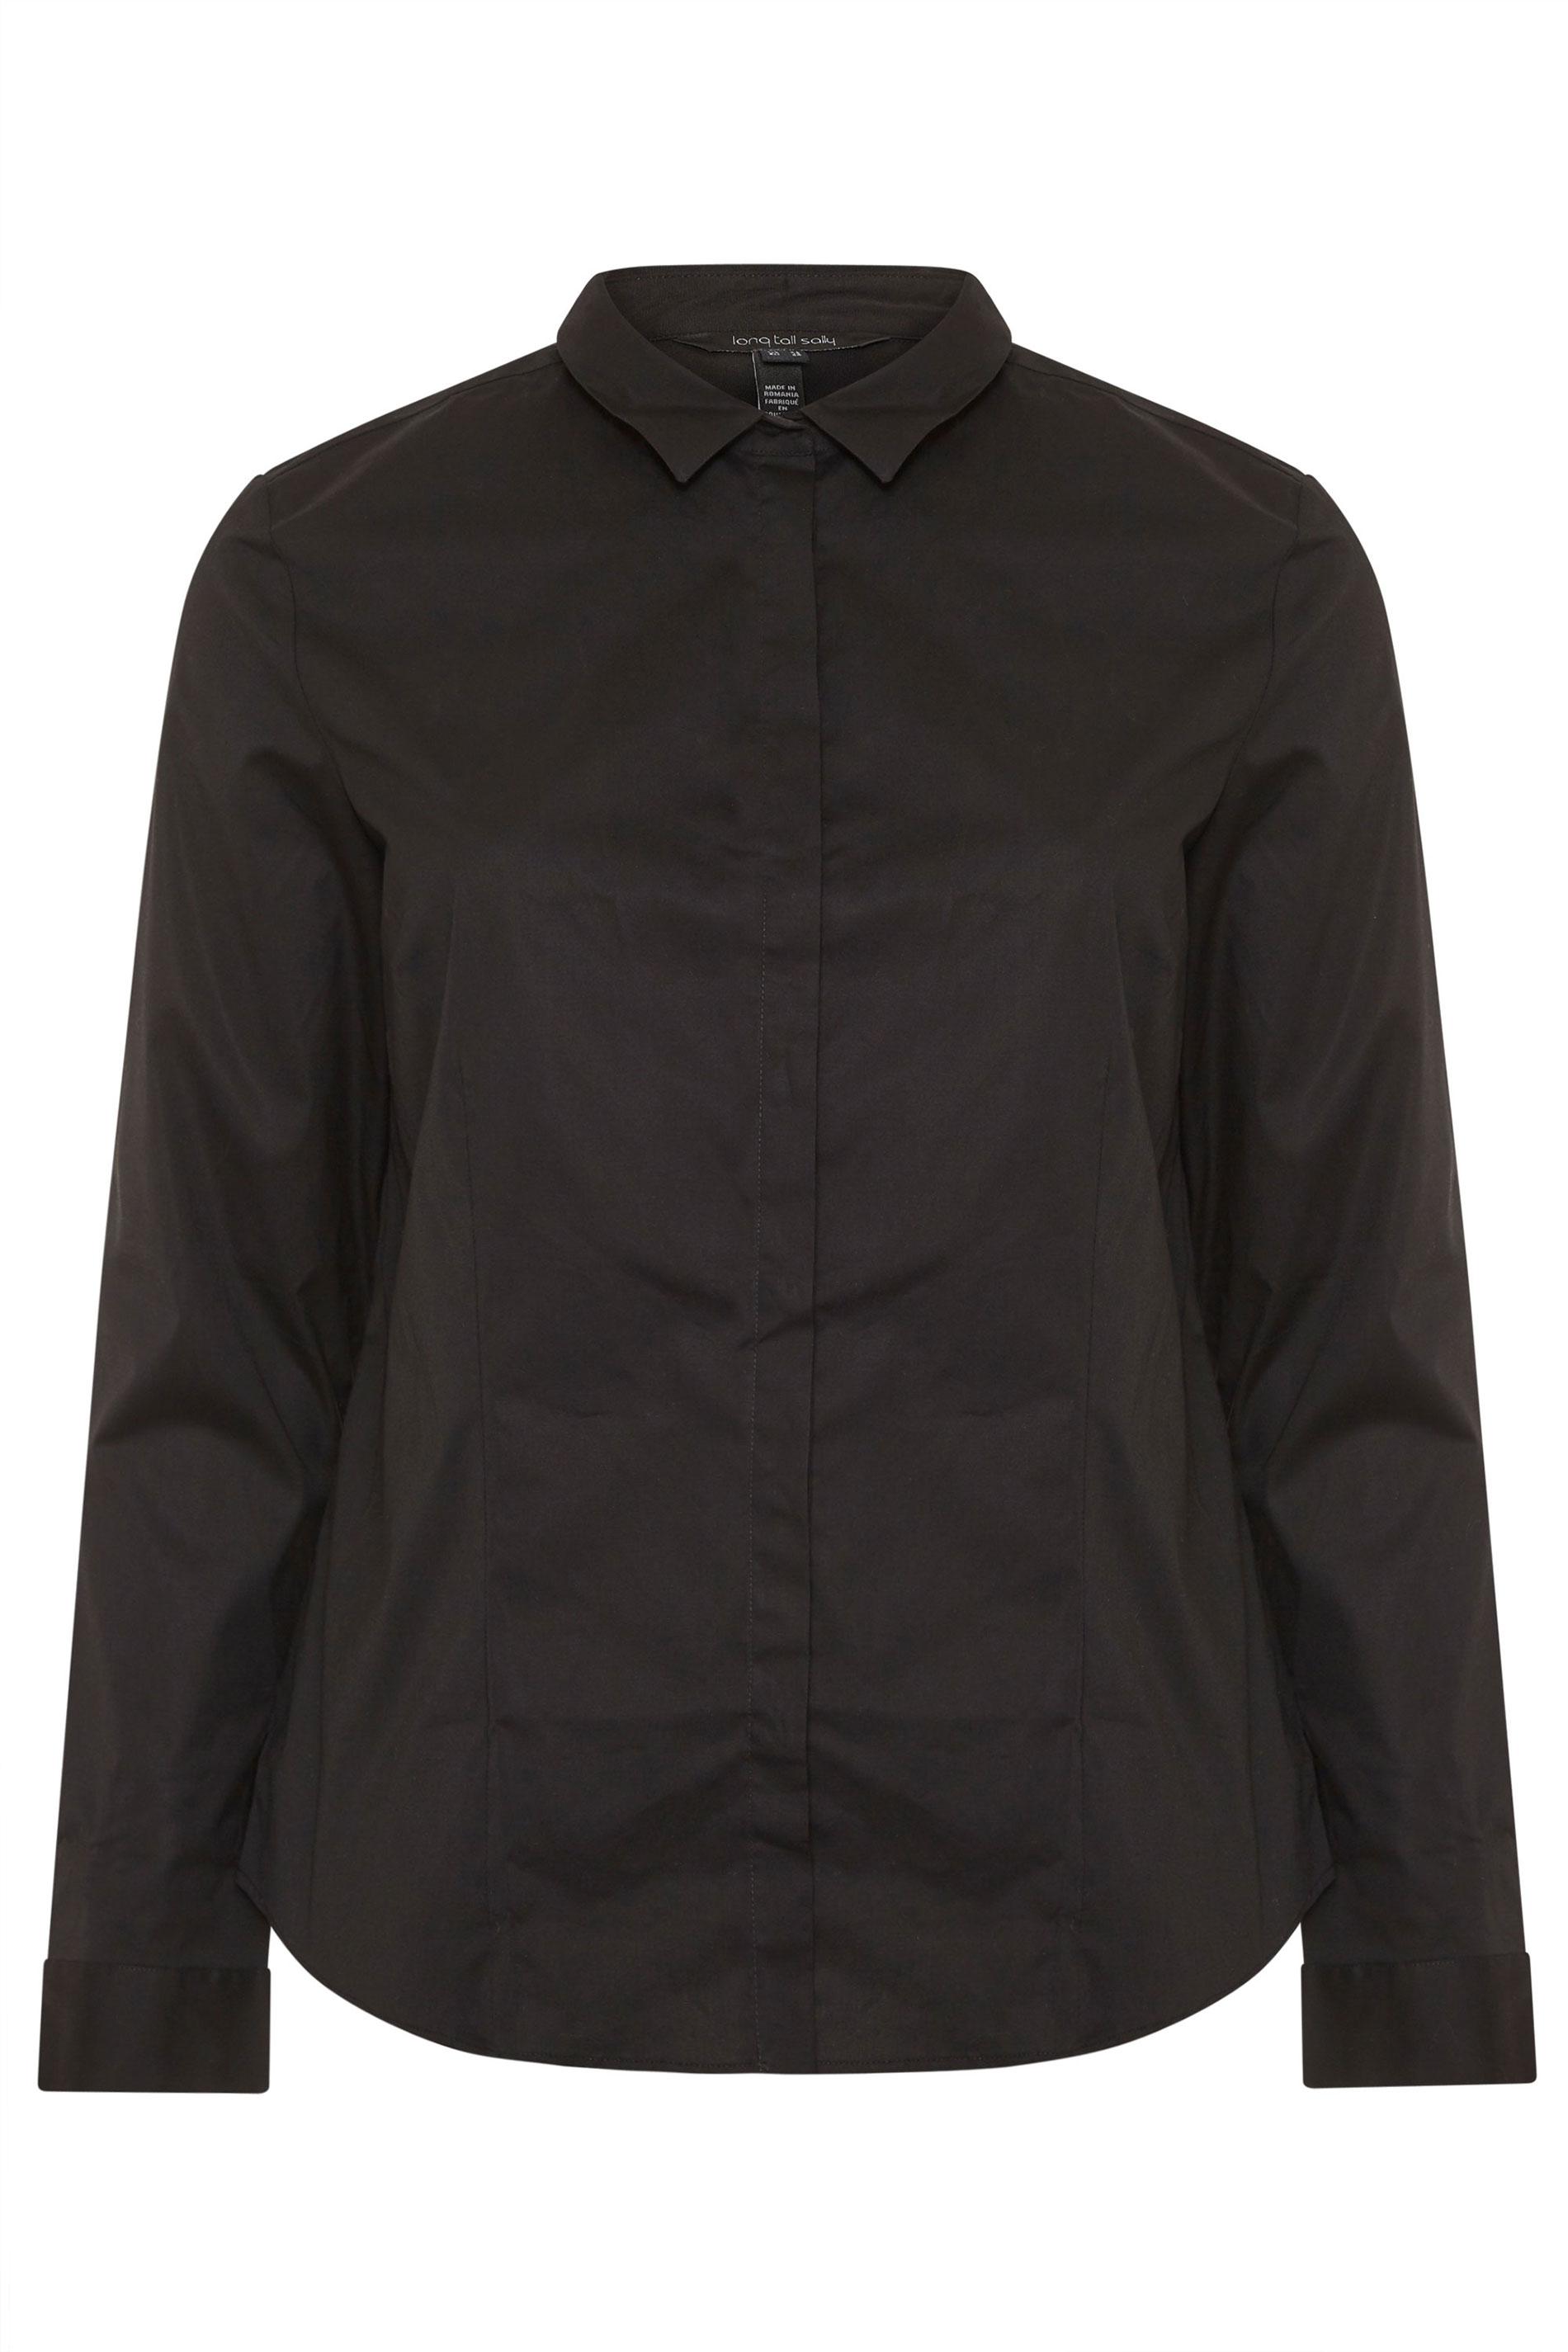 Black Cotton Stretch Work Shirt